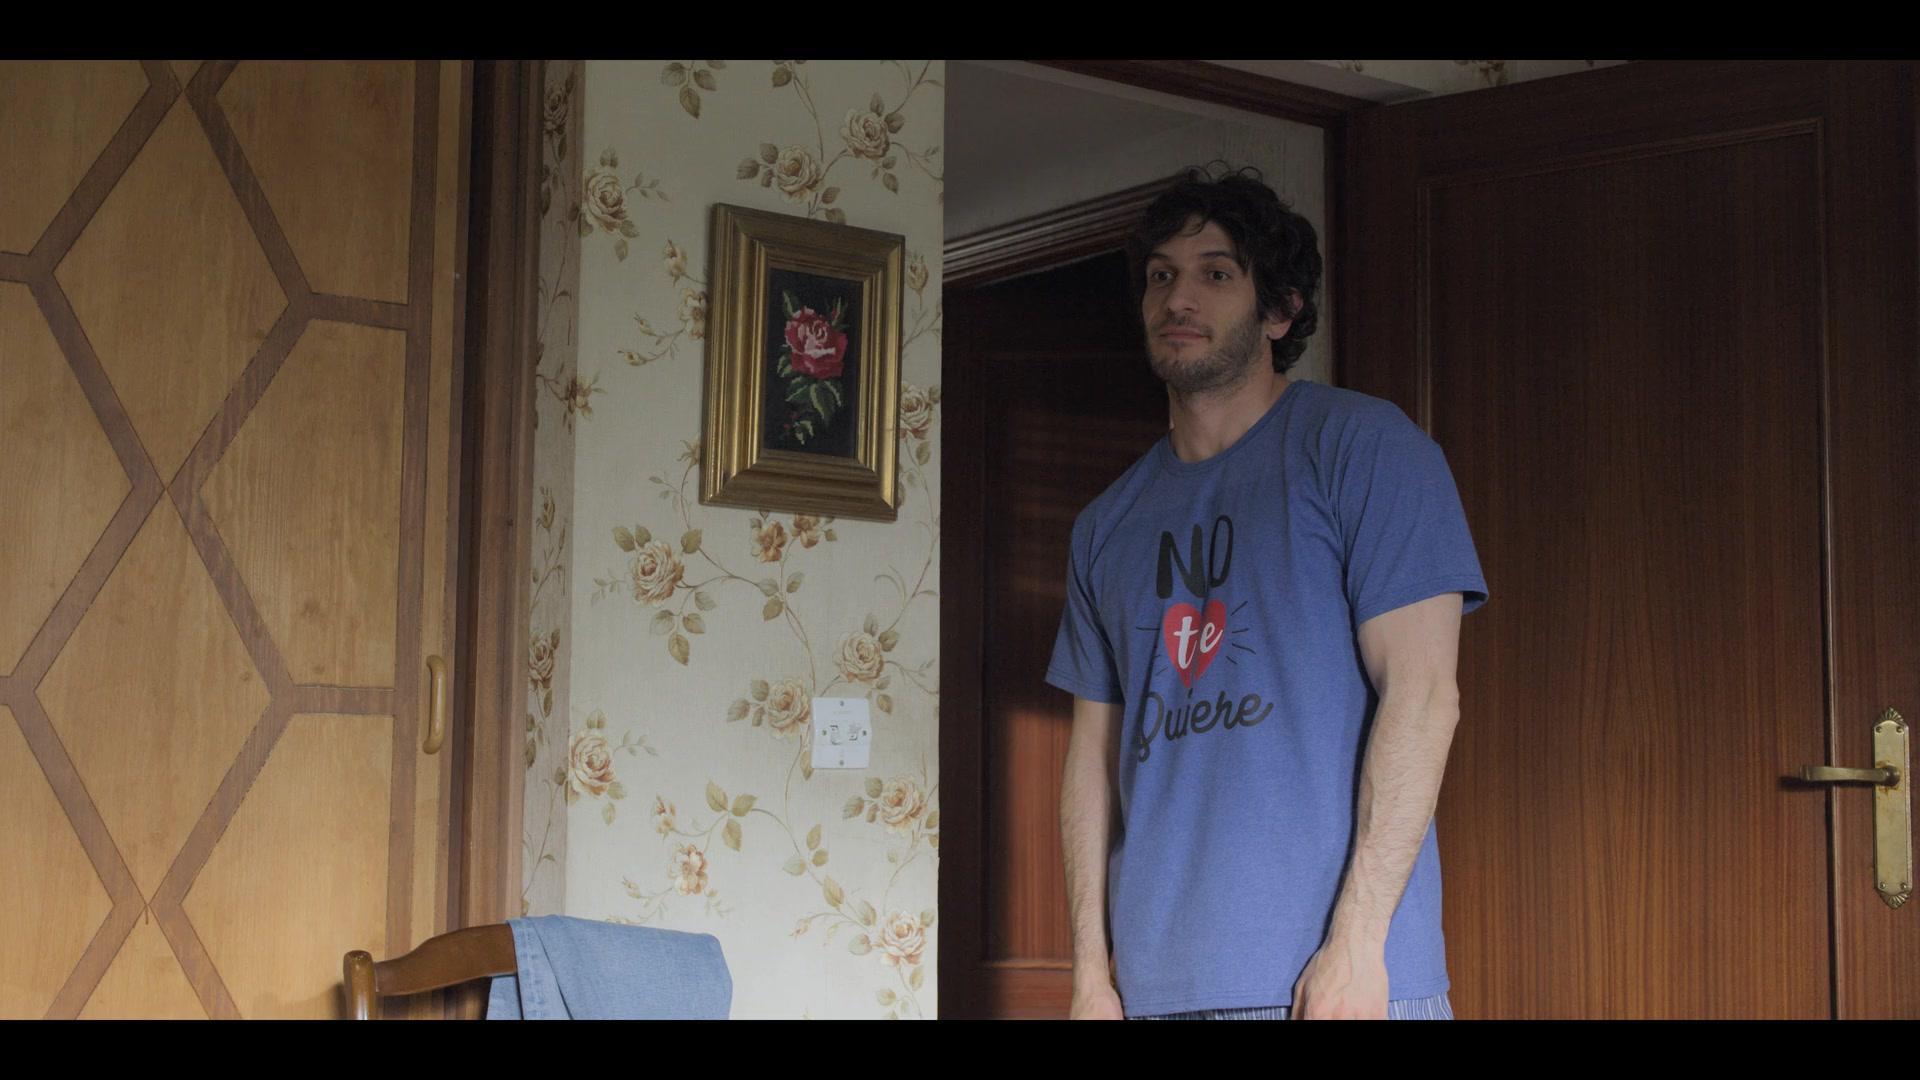 The Neighbor S01